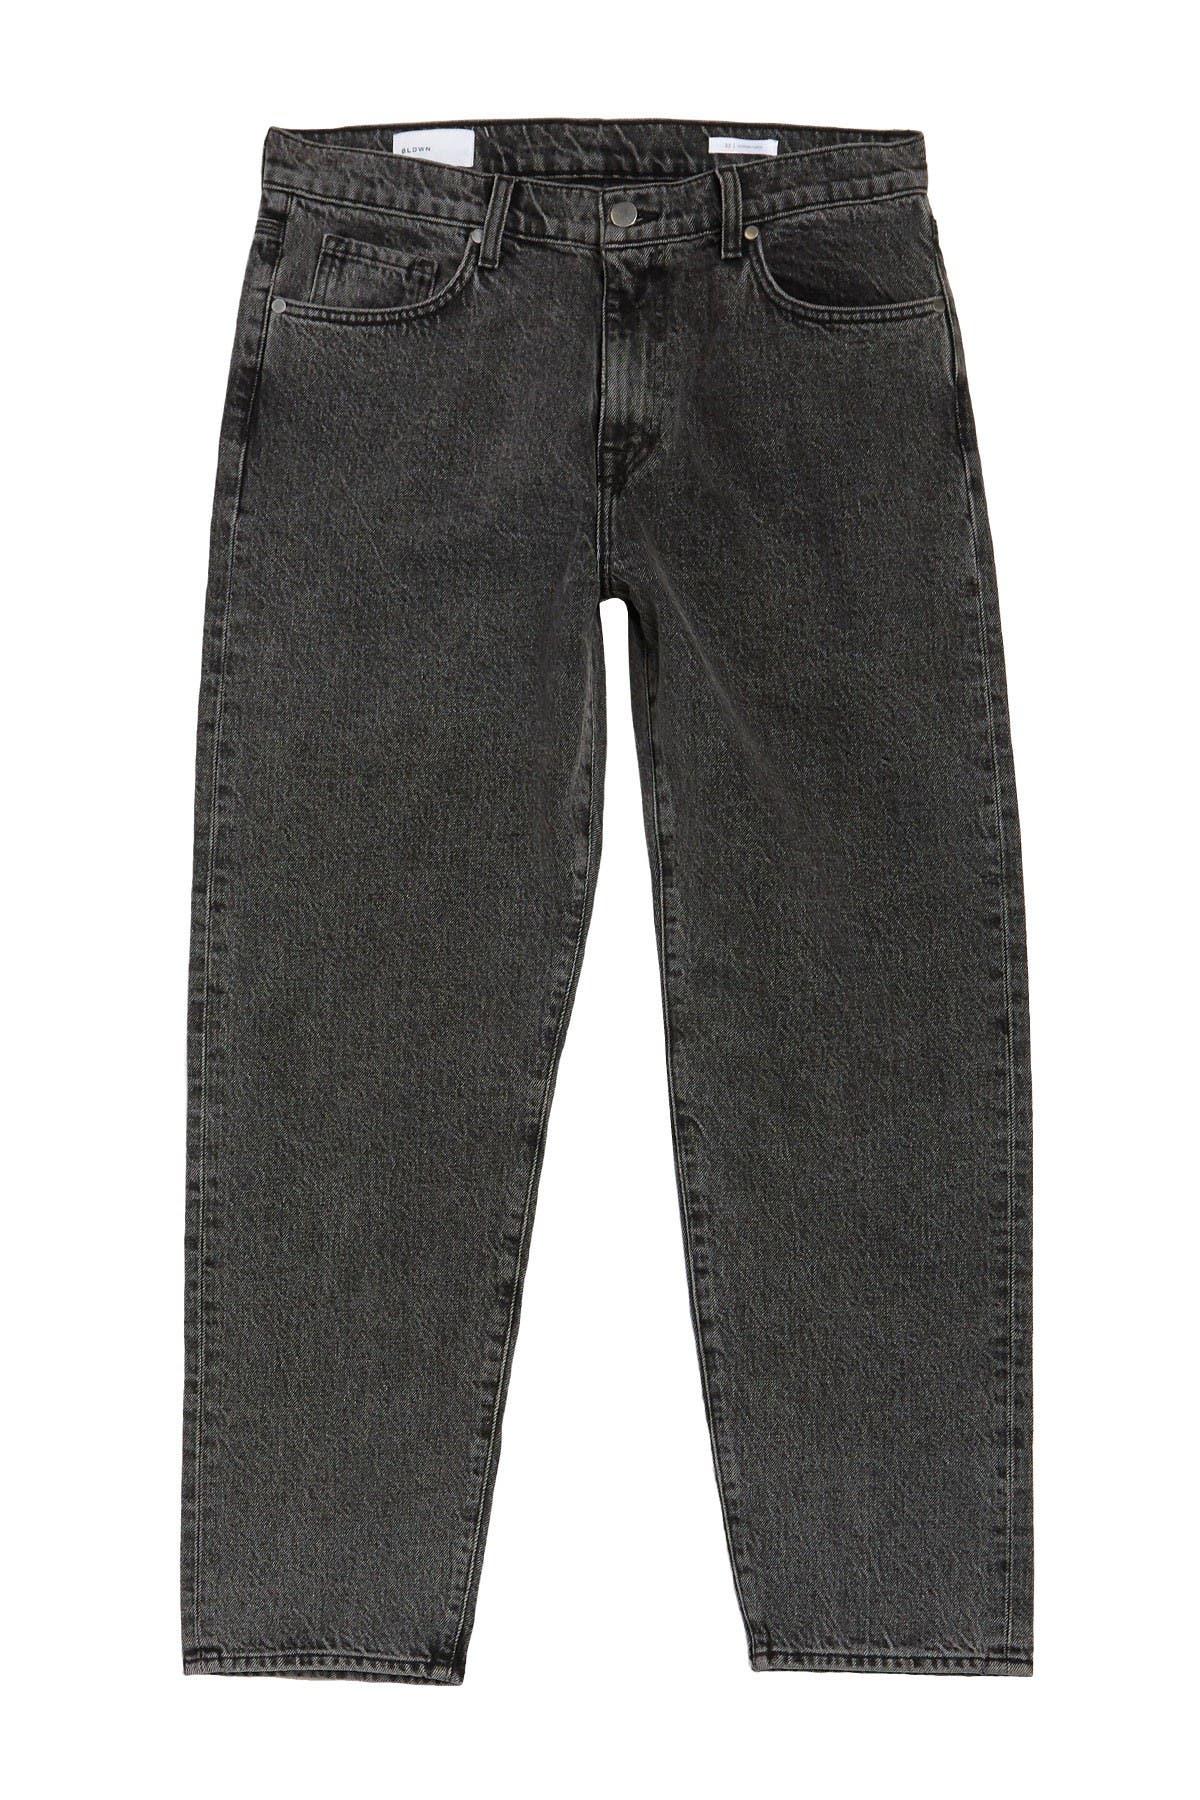 Image of BALDWIN Modern Athletic Fit Acid Wash Jeans